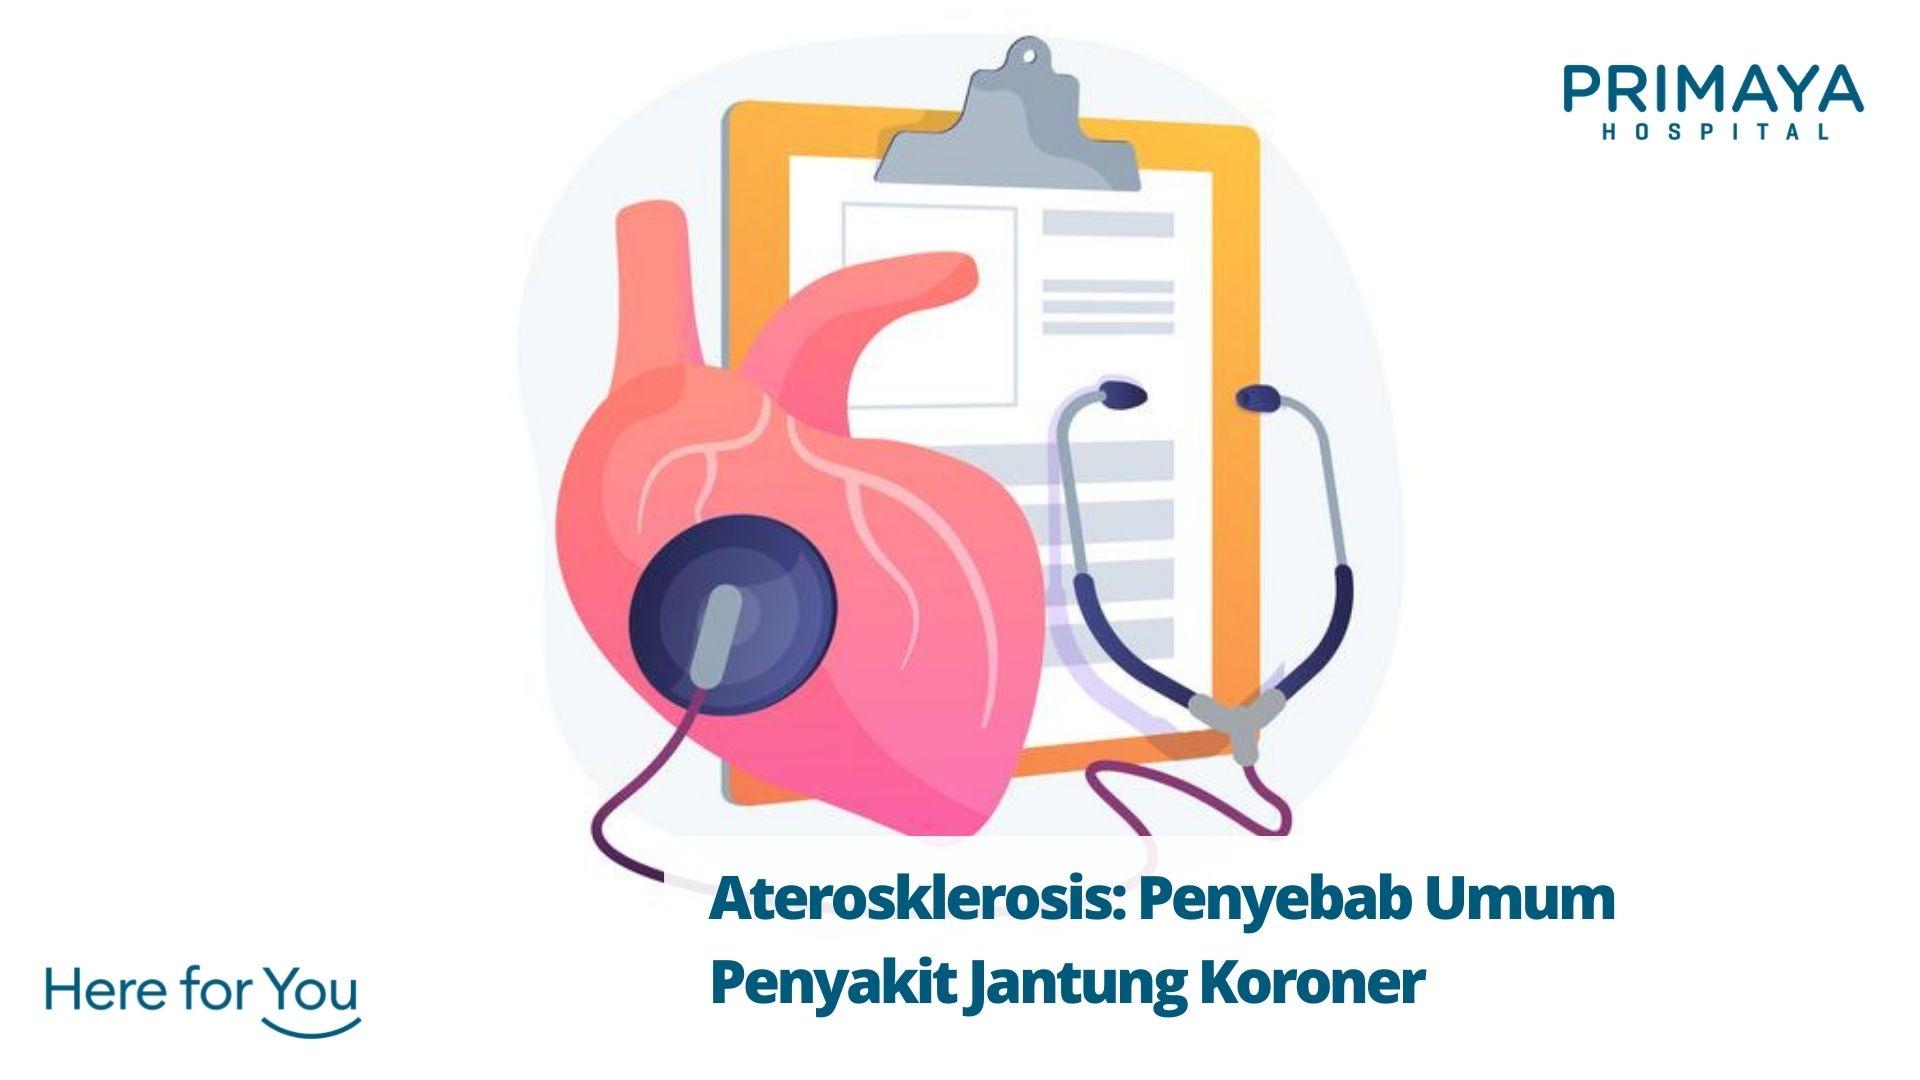 Aterosklerosis Penyebab Umum Penyakit Jantung Koroner